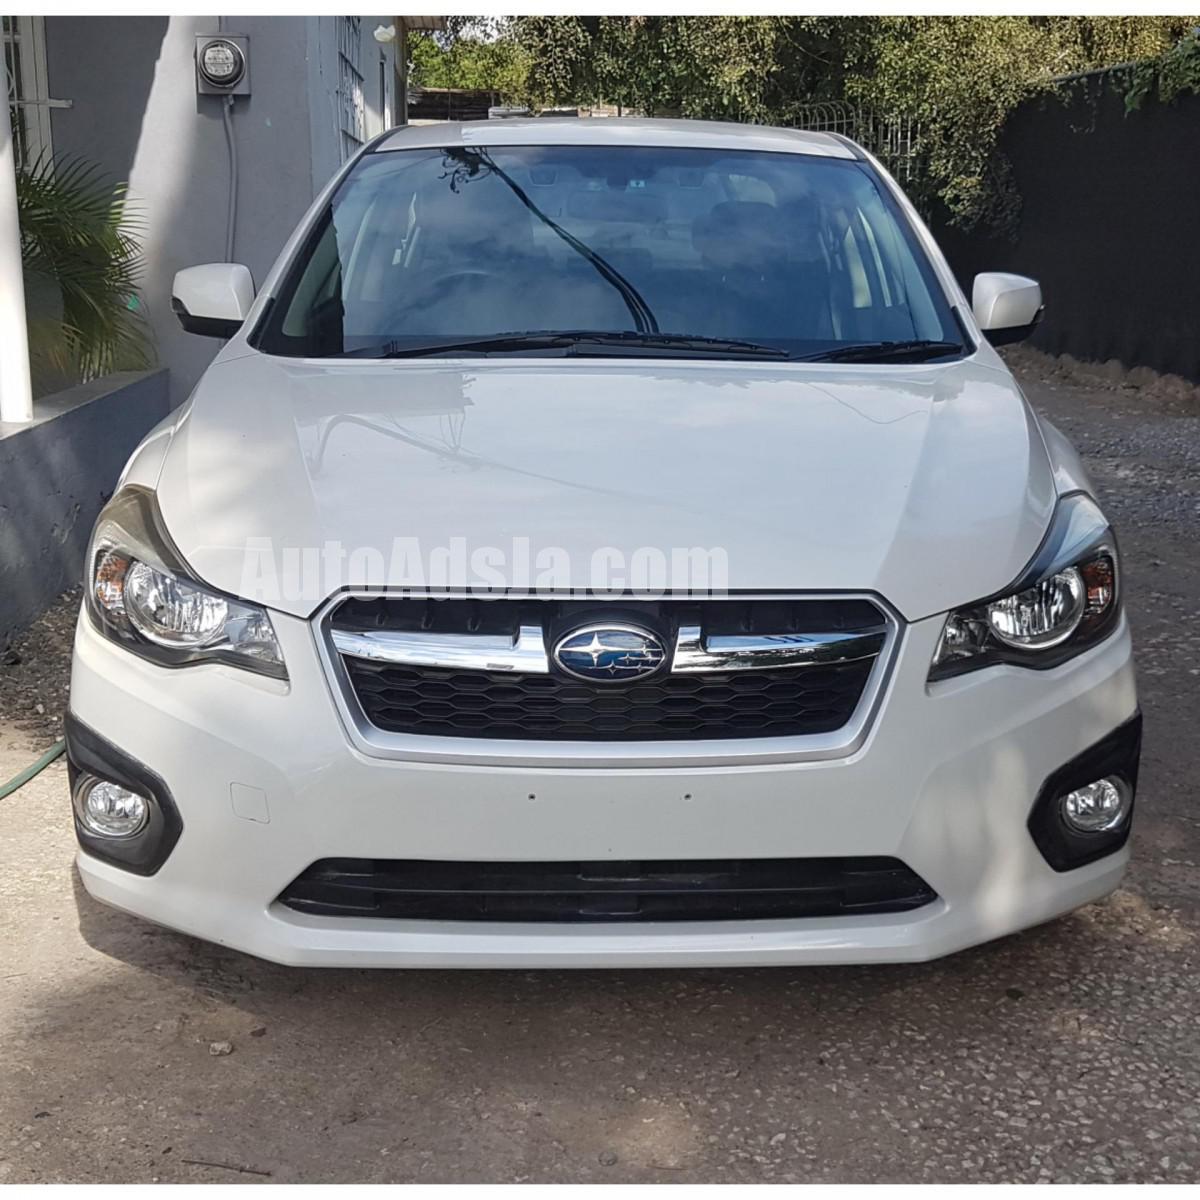 1993 Subaru Justy Transmission: 2013 Subaru G4 For Sale In Kingston / St. Andrew, Jamaica